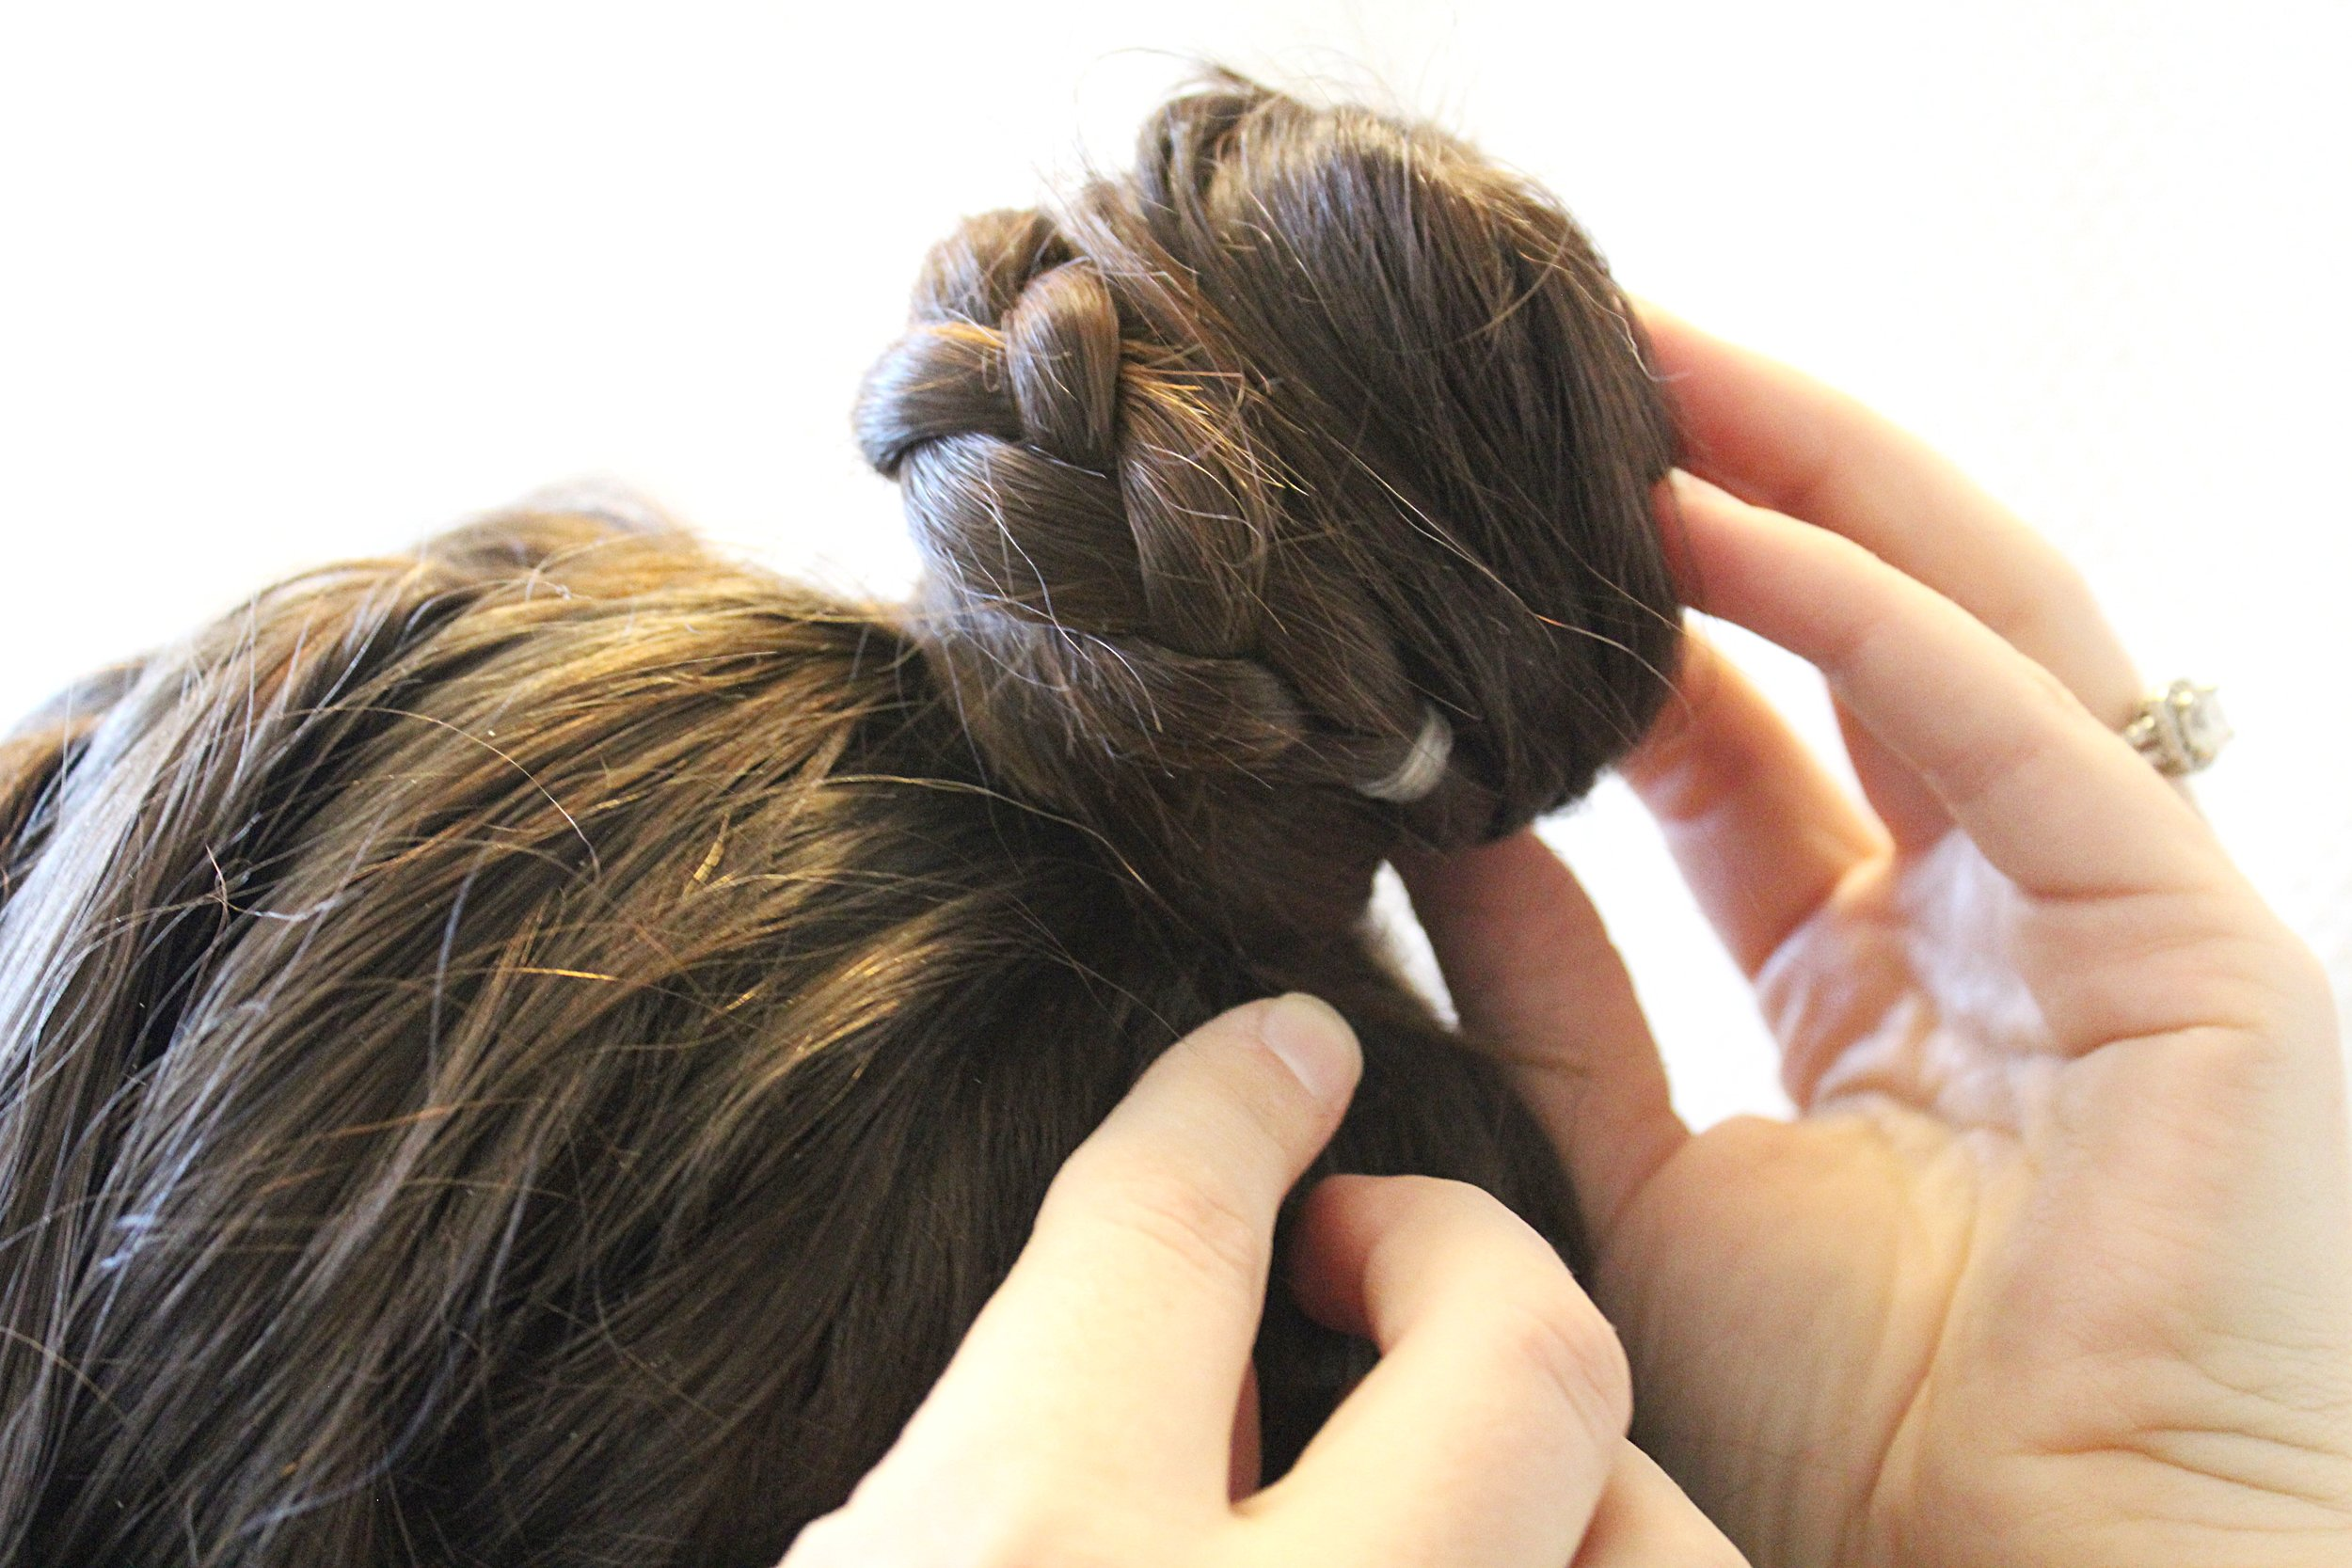 hair-tutorial-braid-bun-look.JPG